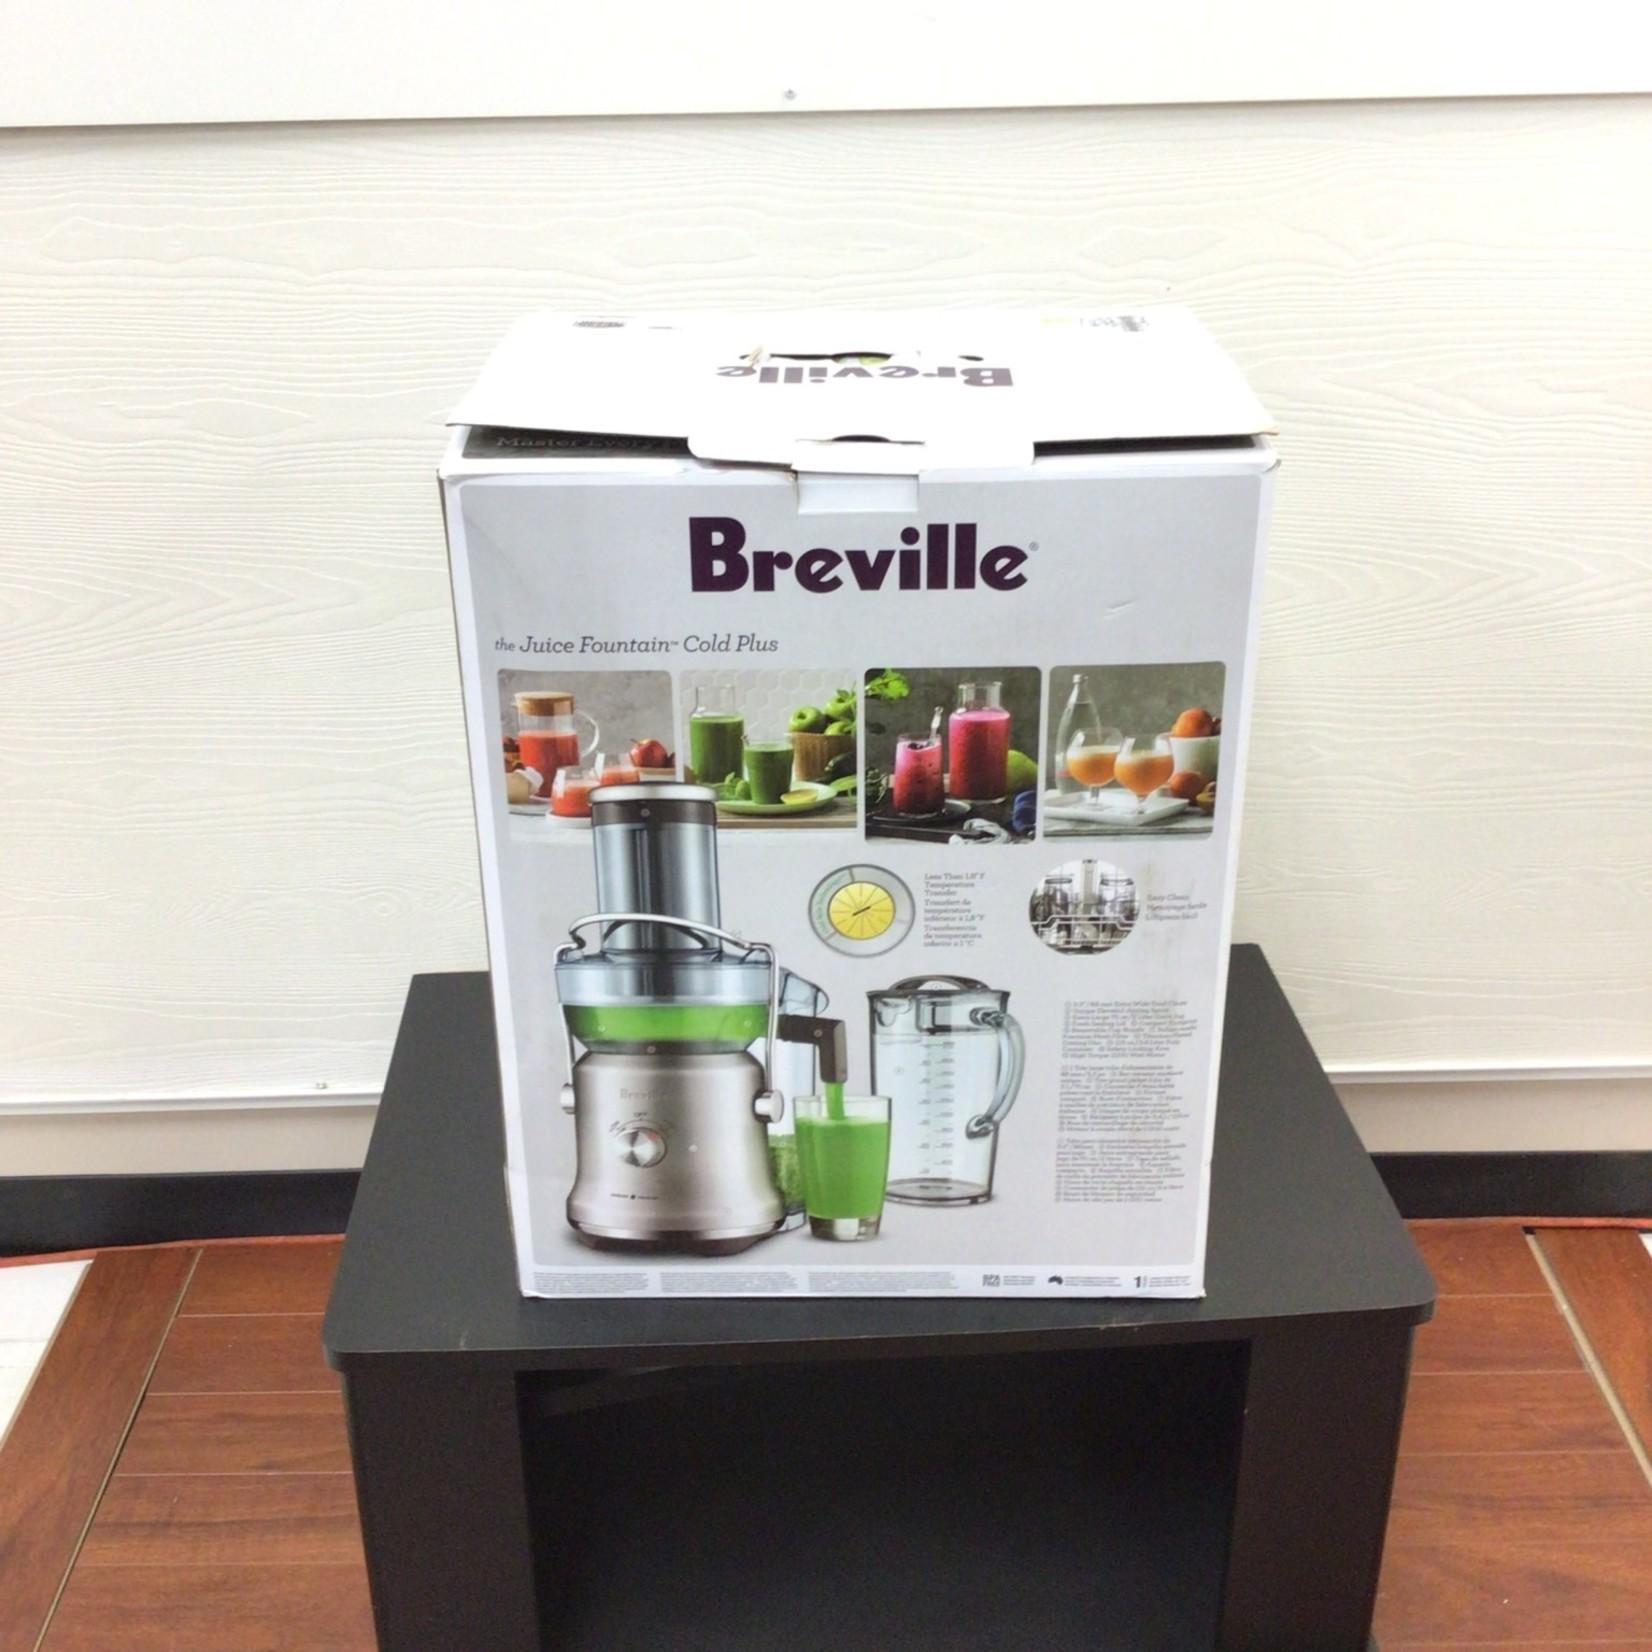 Breville Juice Fountain Plus